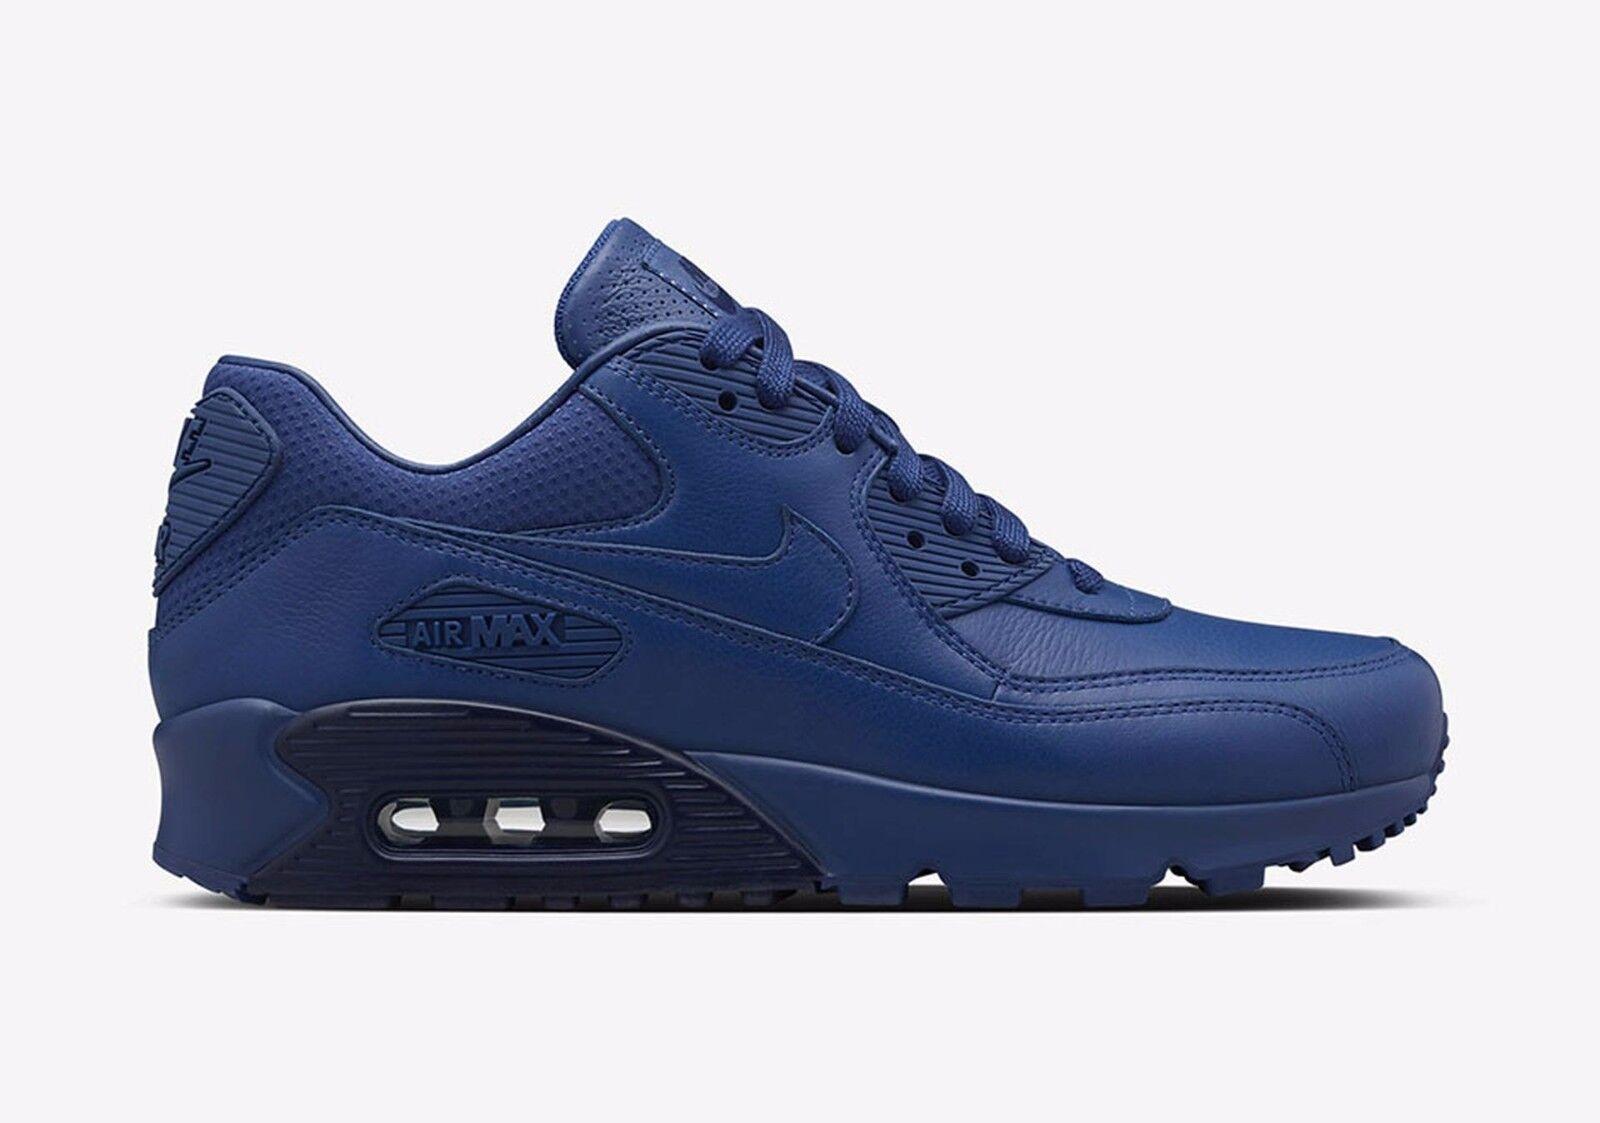 Nike Air Max 90 Pinnacle Insignia bluee Binary bluee 839612-400 Wmn Sz 6.5 Leather